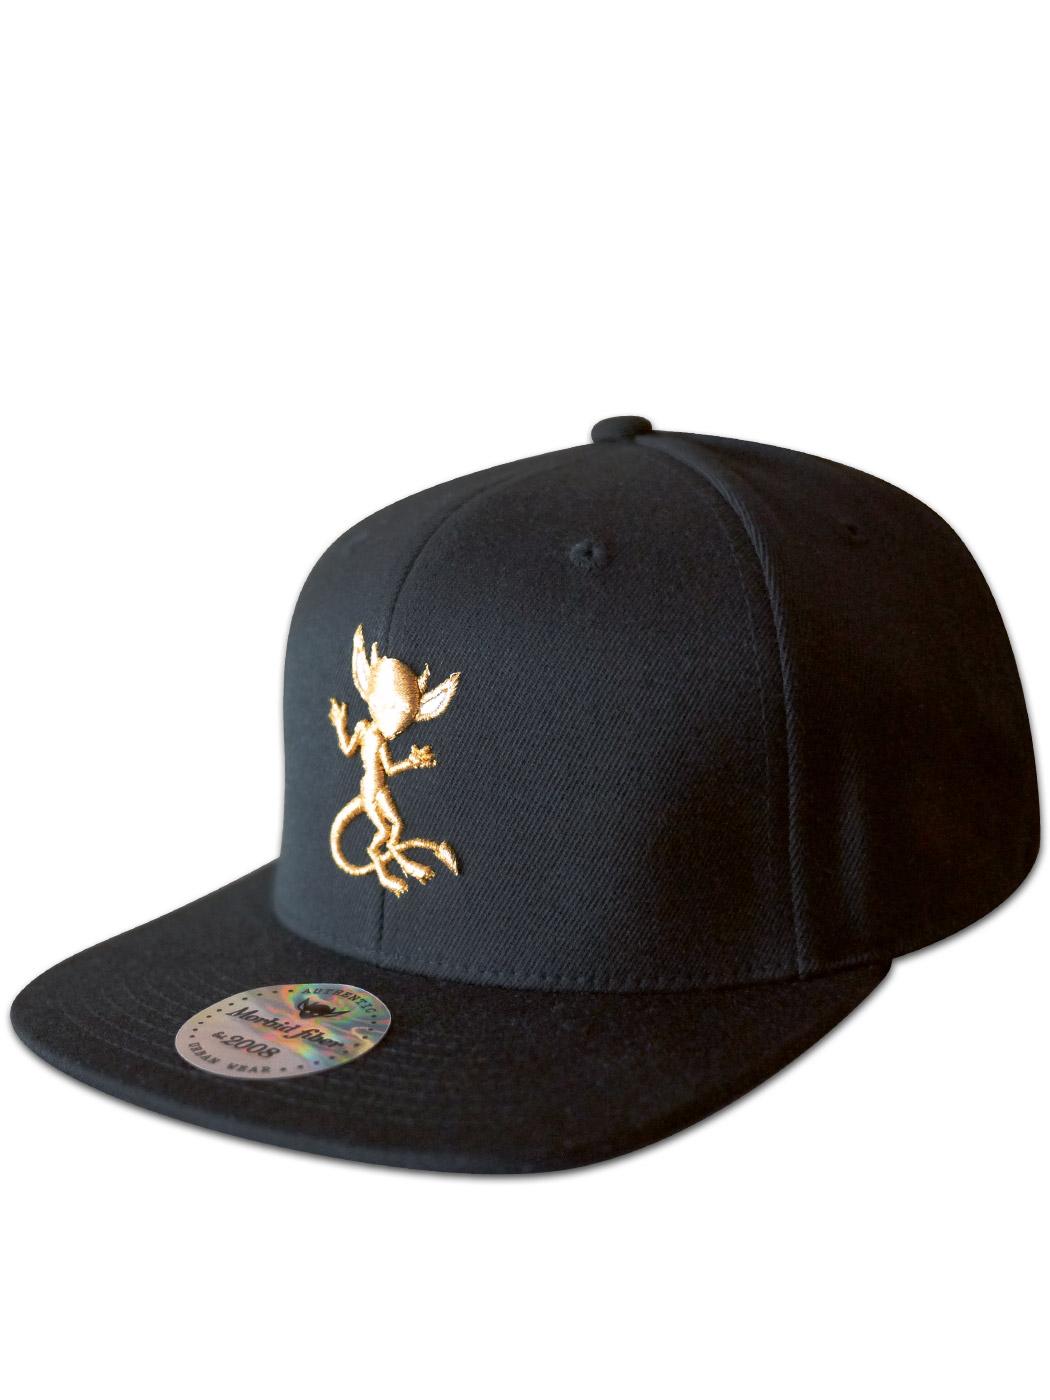 b40287505fb964 Morbid Fiber Los Angeles Clothing Streetwear Snapback GOLD IMP Hat